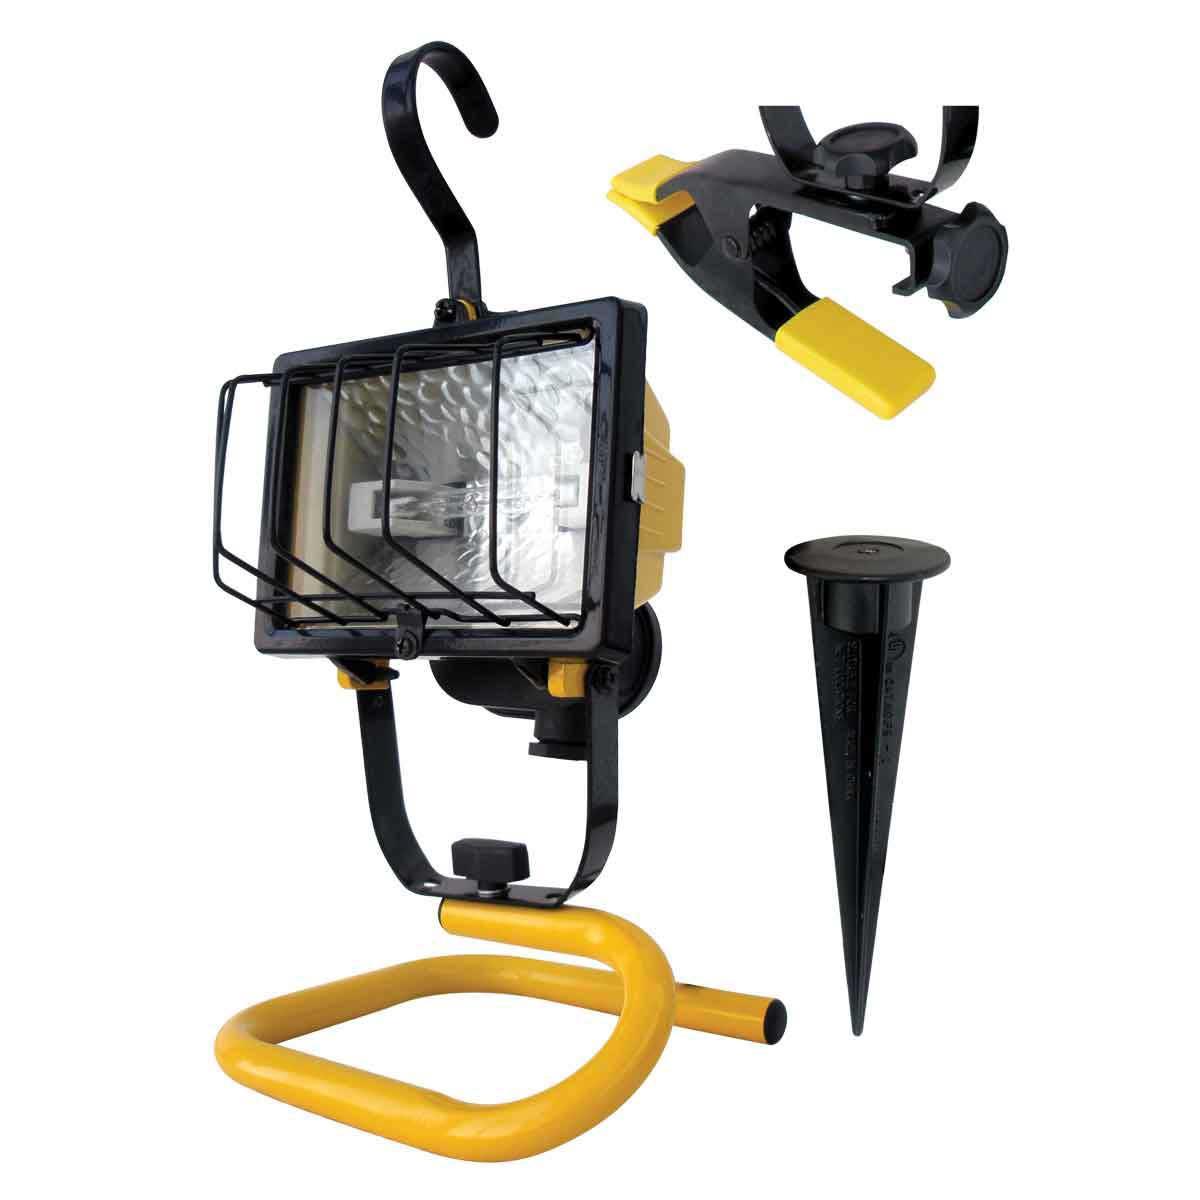 voltec 250 watt heavy duty tripod clamp light